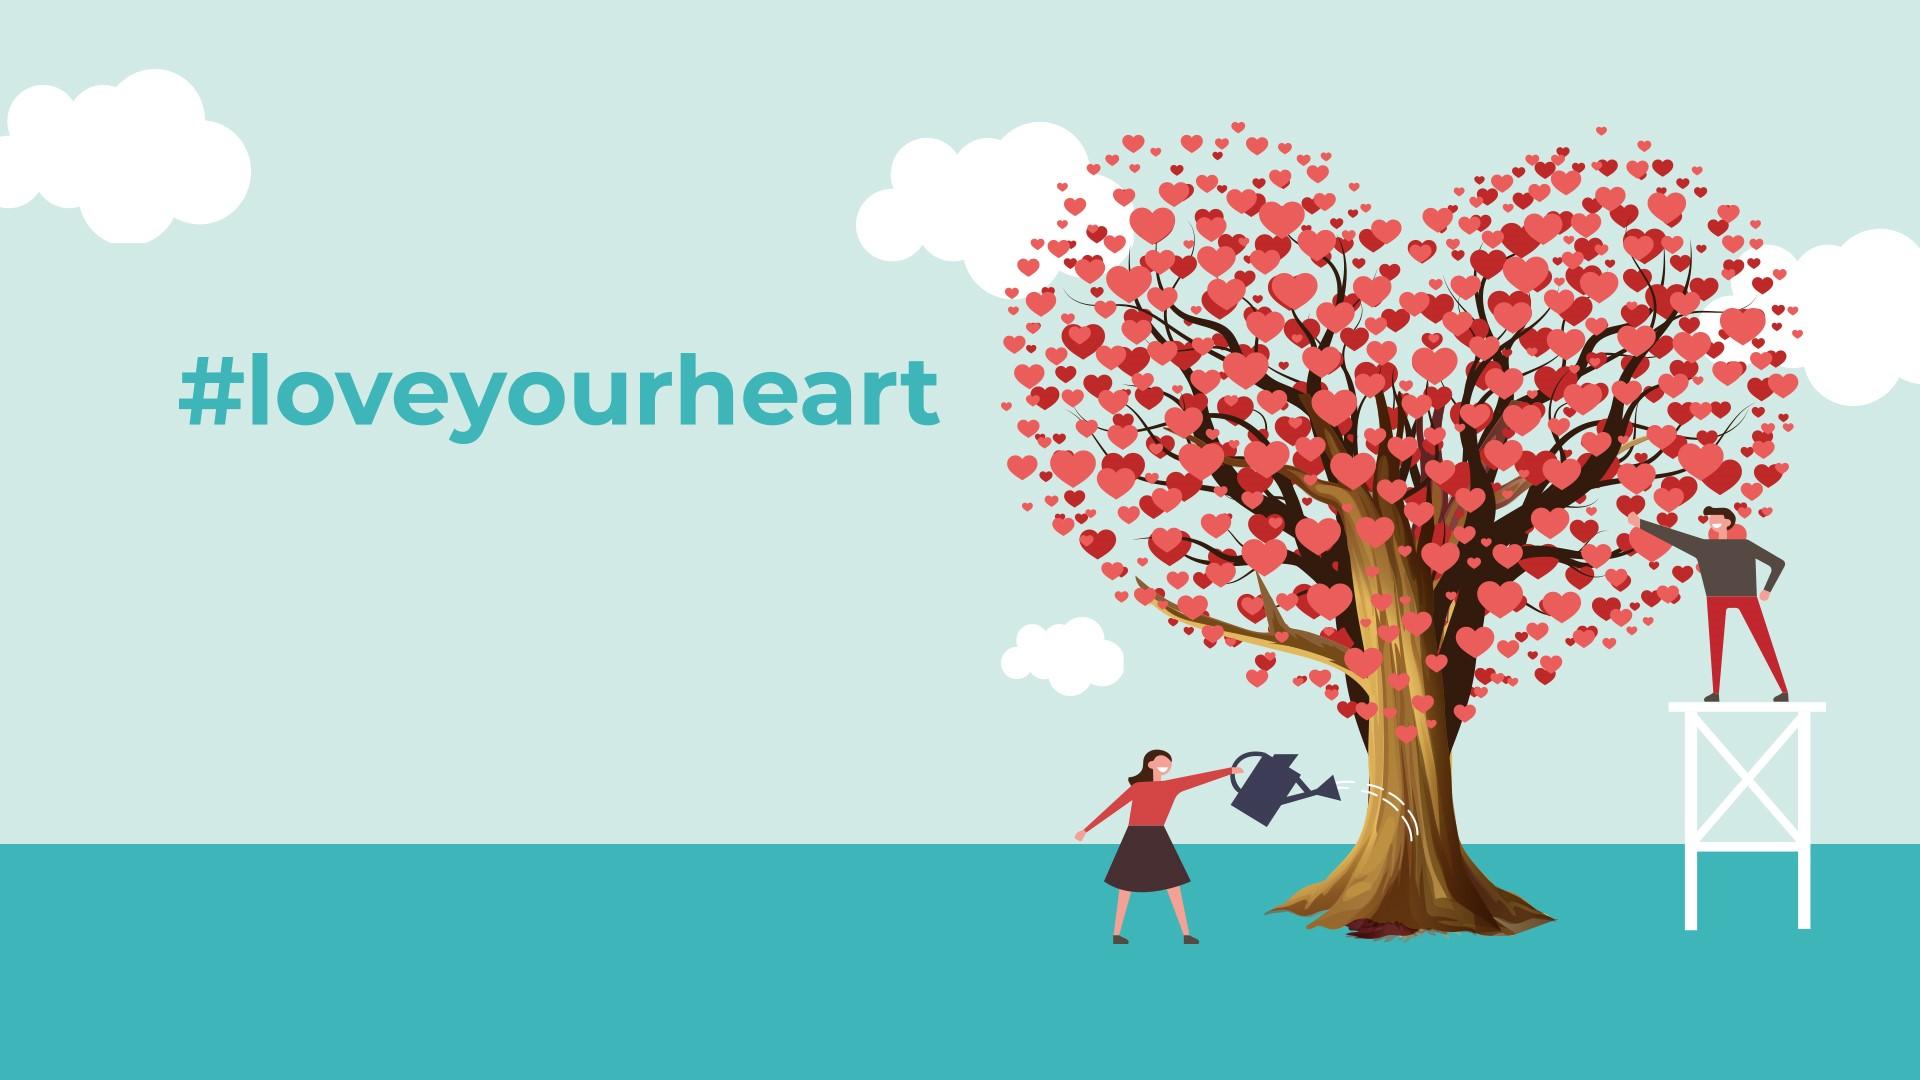 Heart Campaign | February 2019